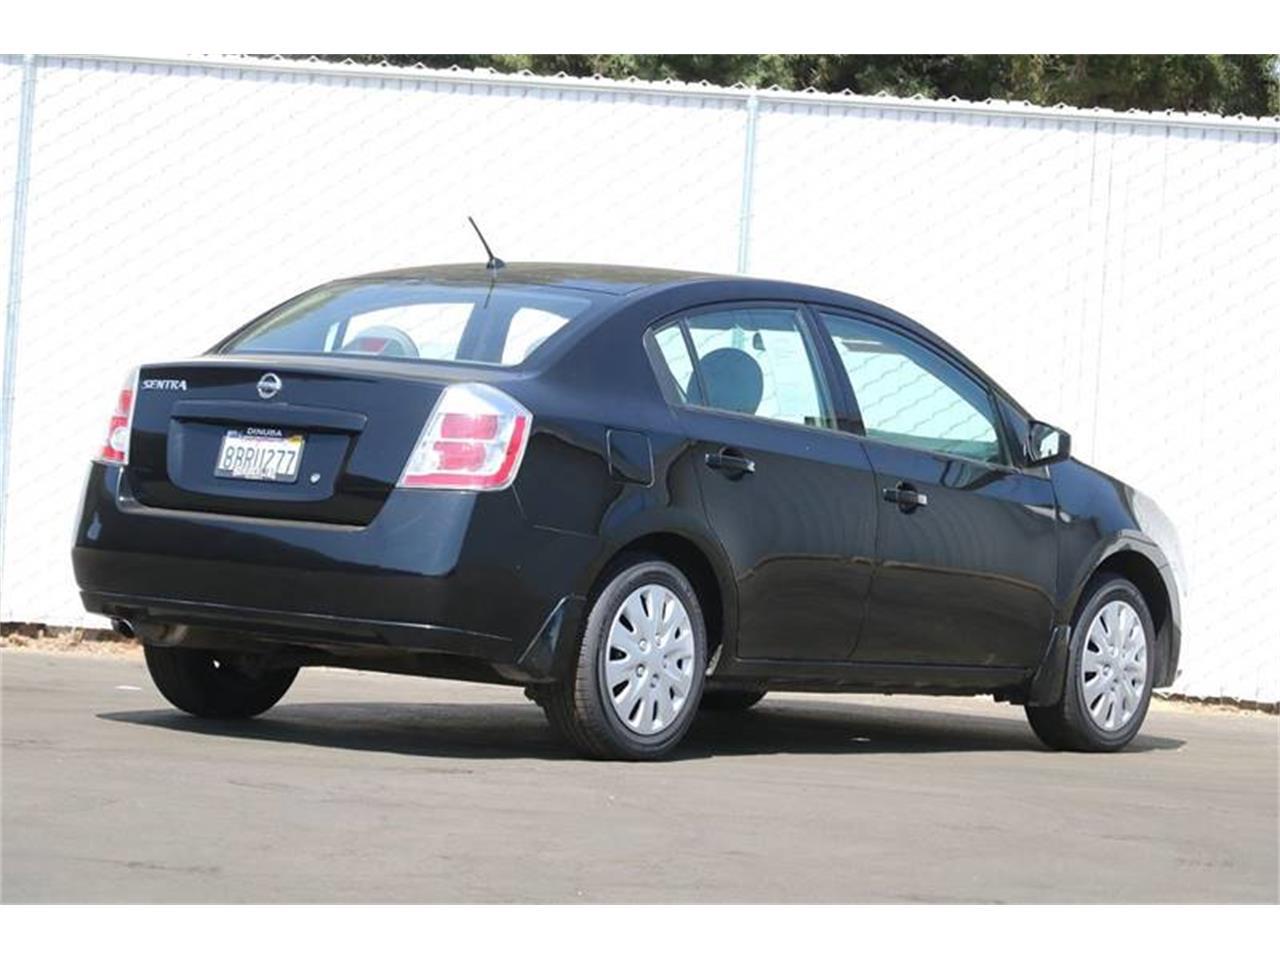 2009 Nissan Sentra (CC-1310484) for sale in Dinuba, California